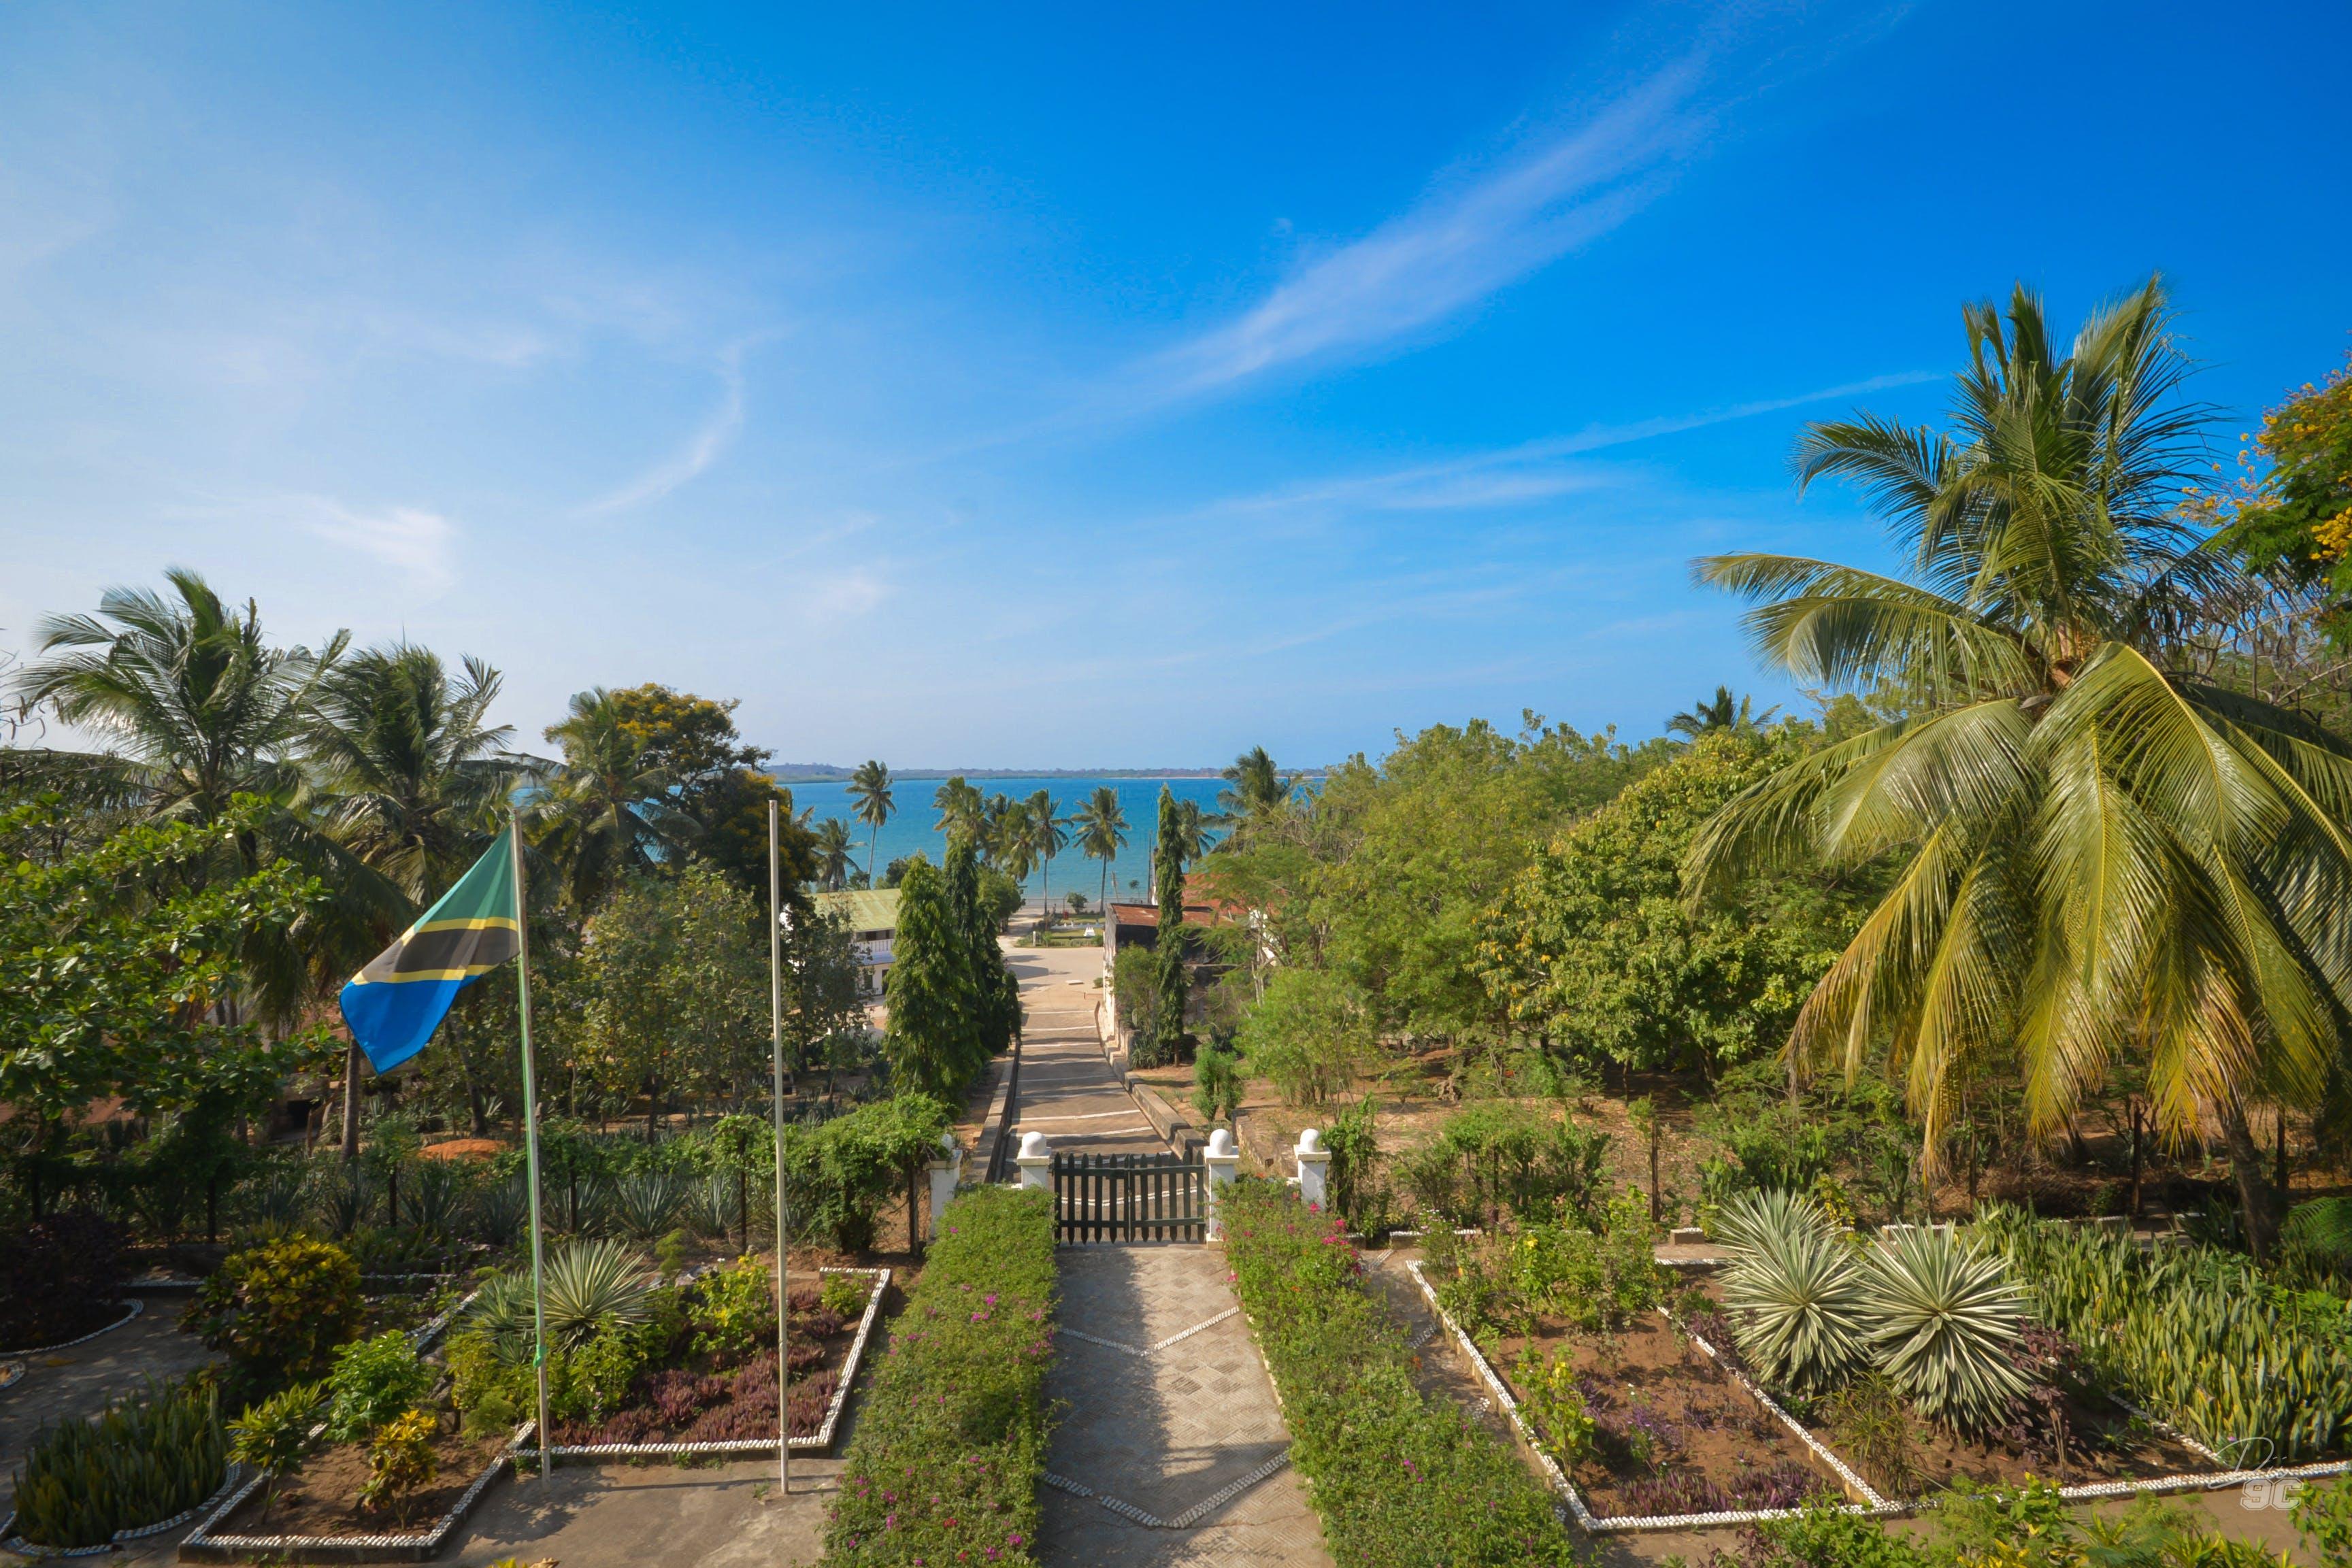 Free stock photo of beautiful Tanzania, dii9c, nature view, ocean